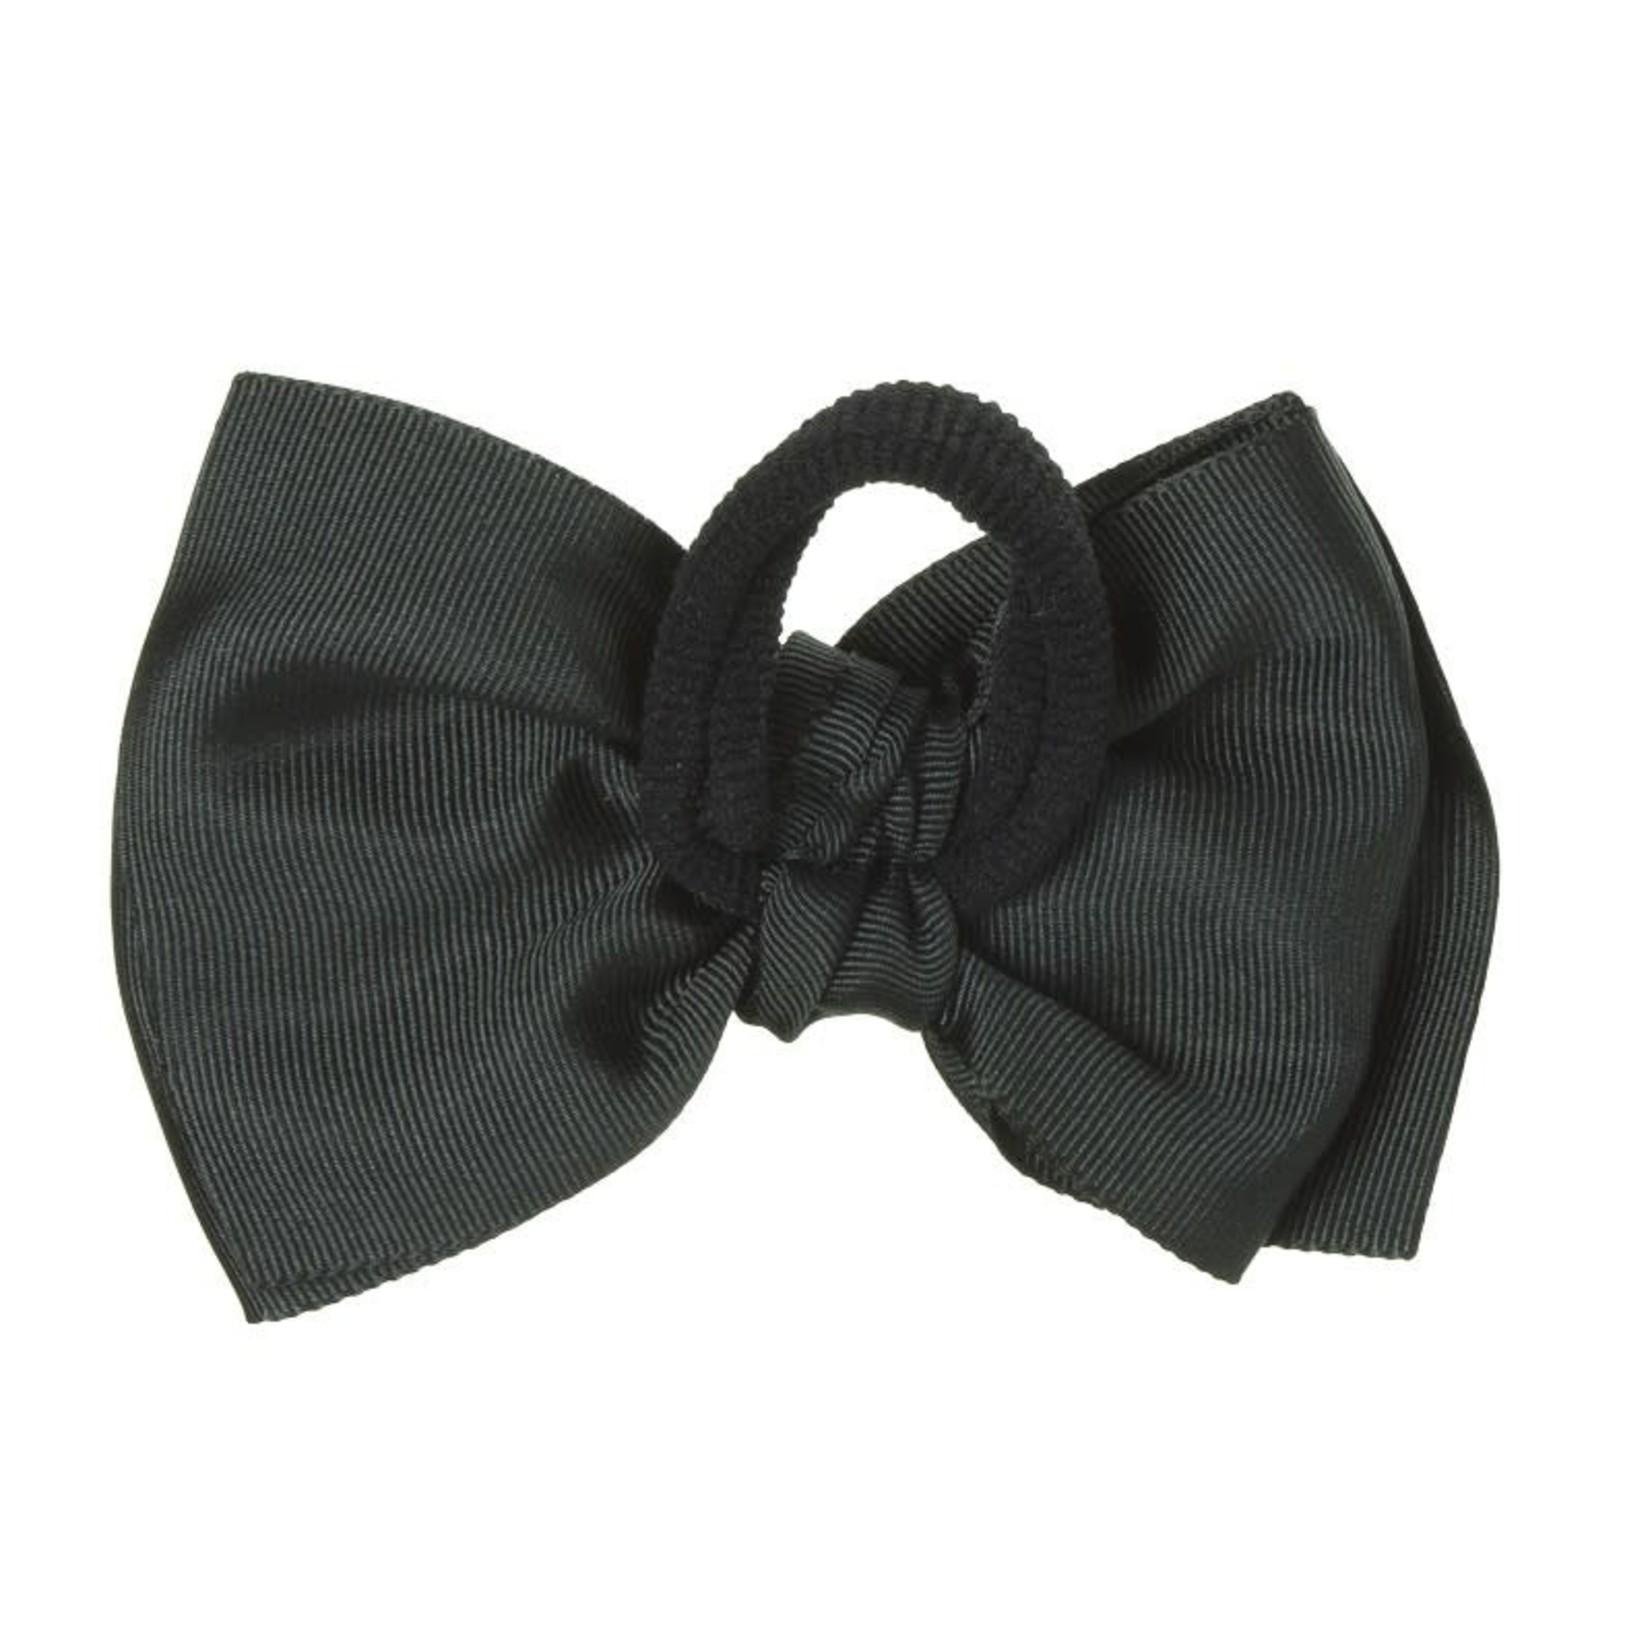 Siena Hair Bow - Black